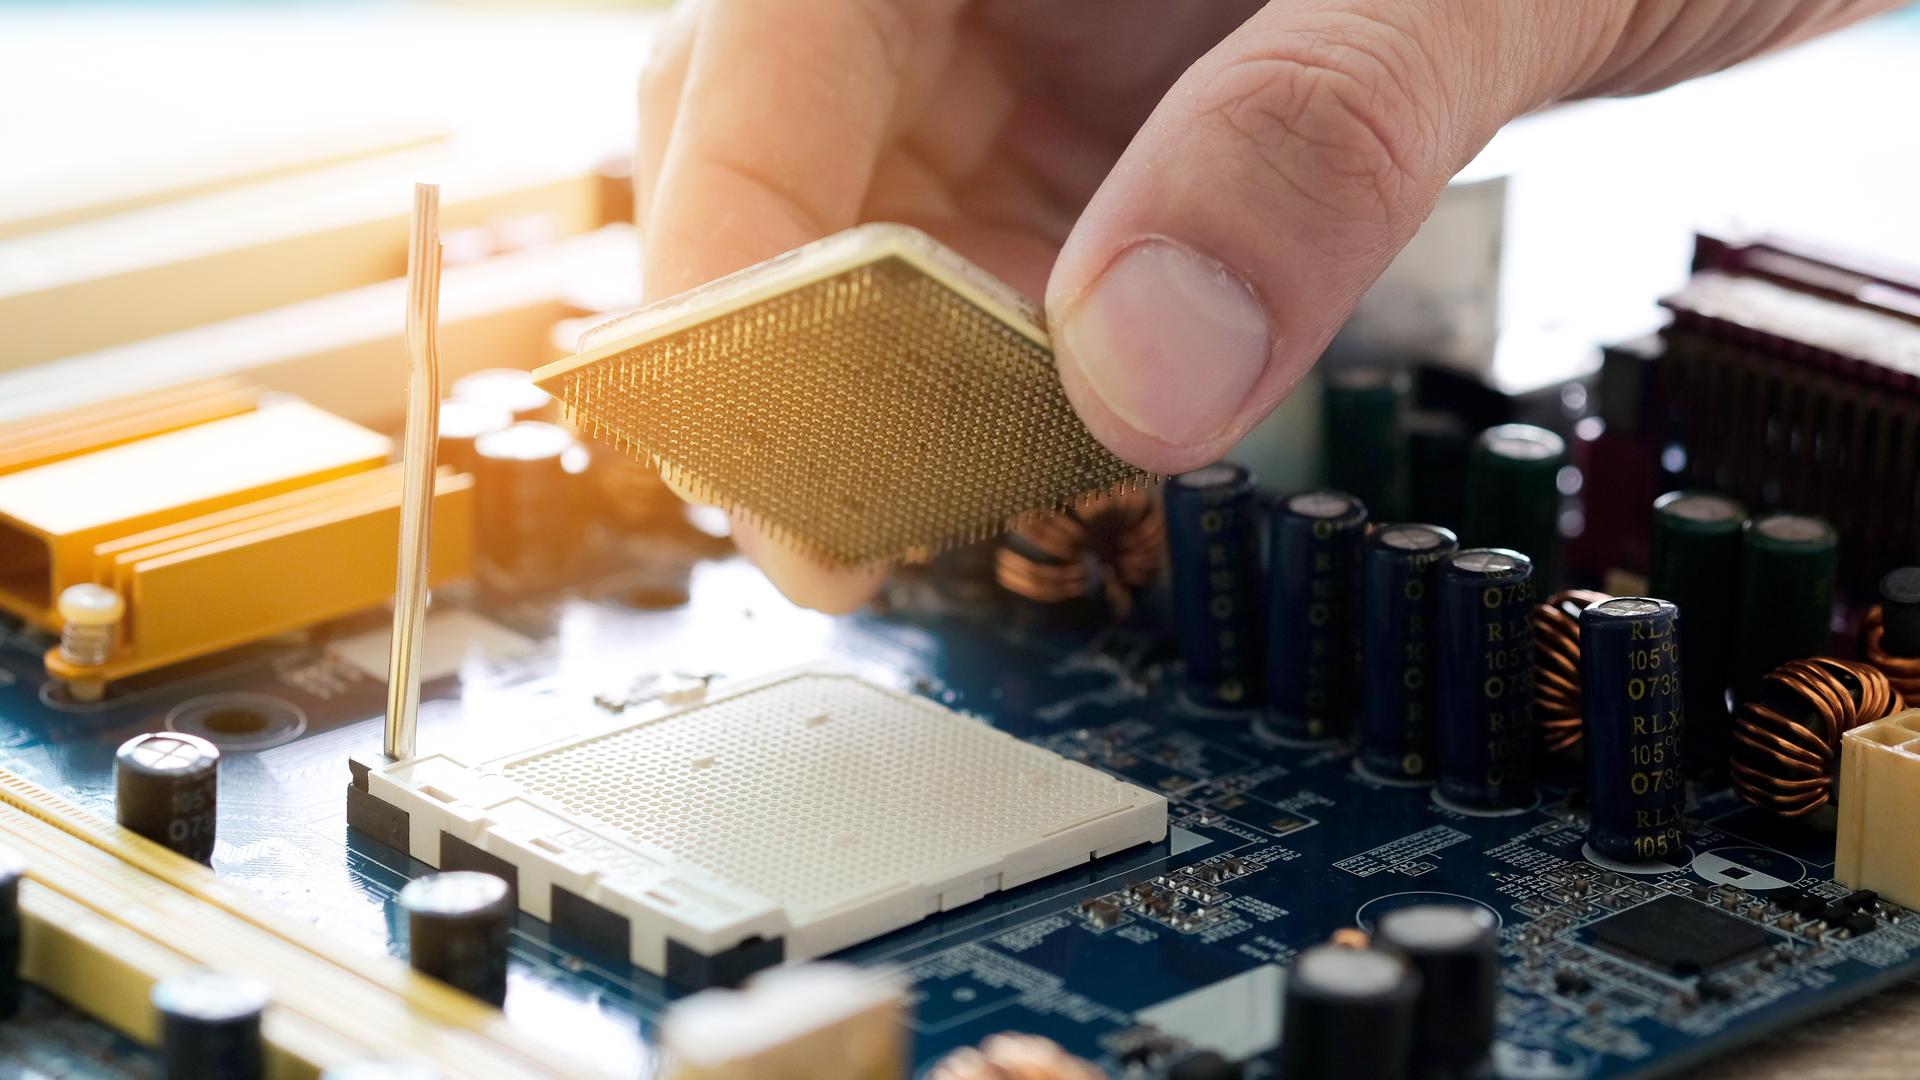 A person installing a CPU